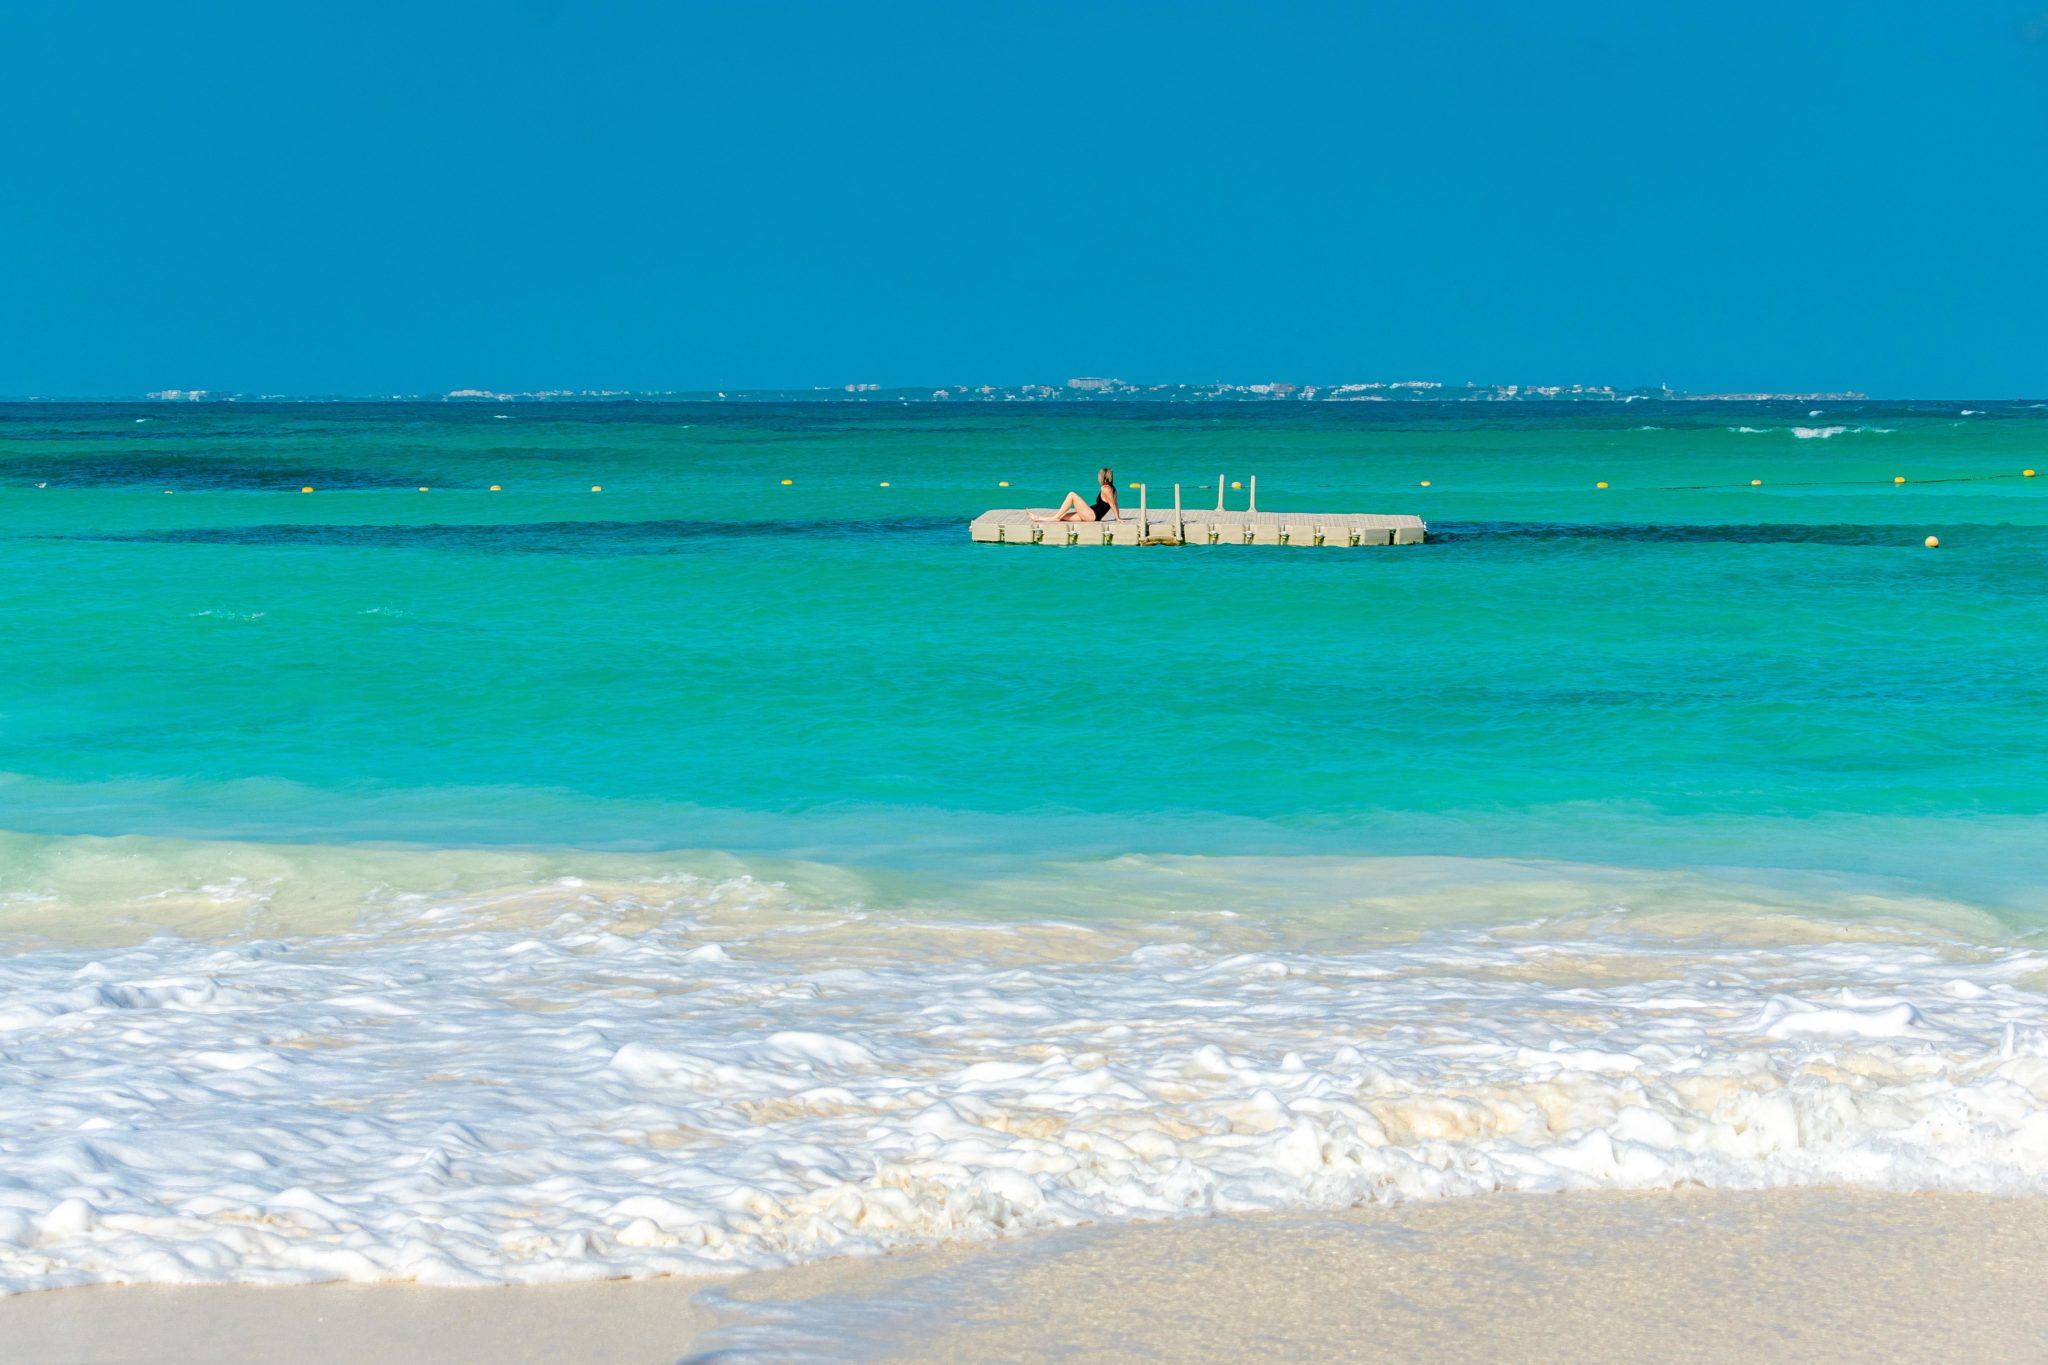 Cancun Calm – Solo Floating Away from La Fiesta